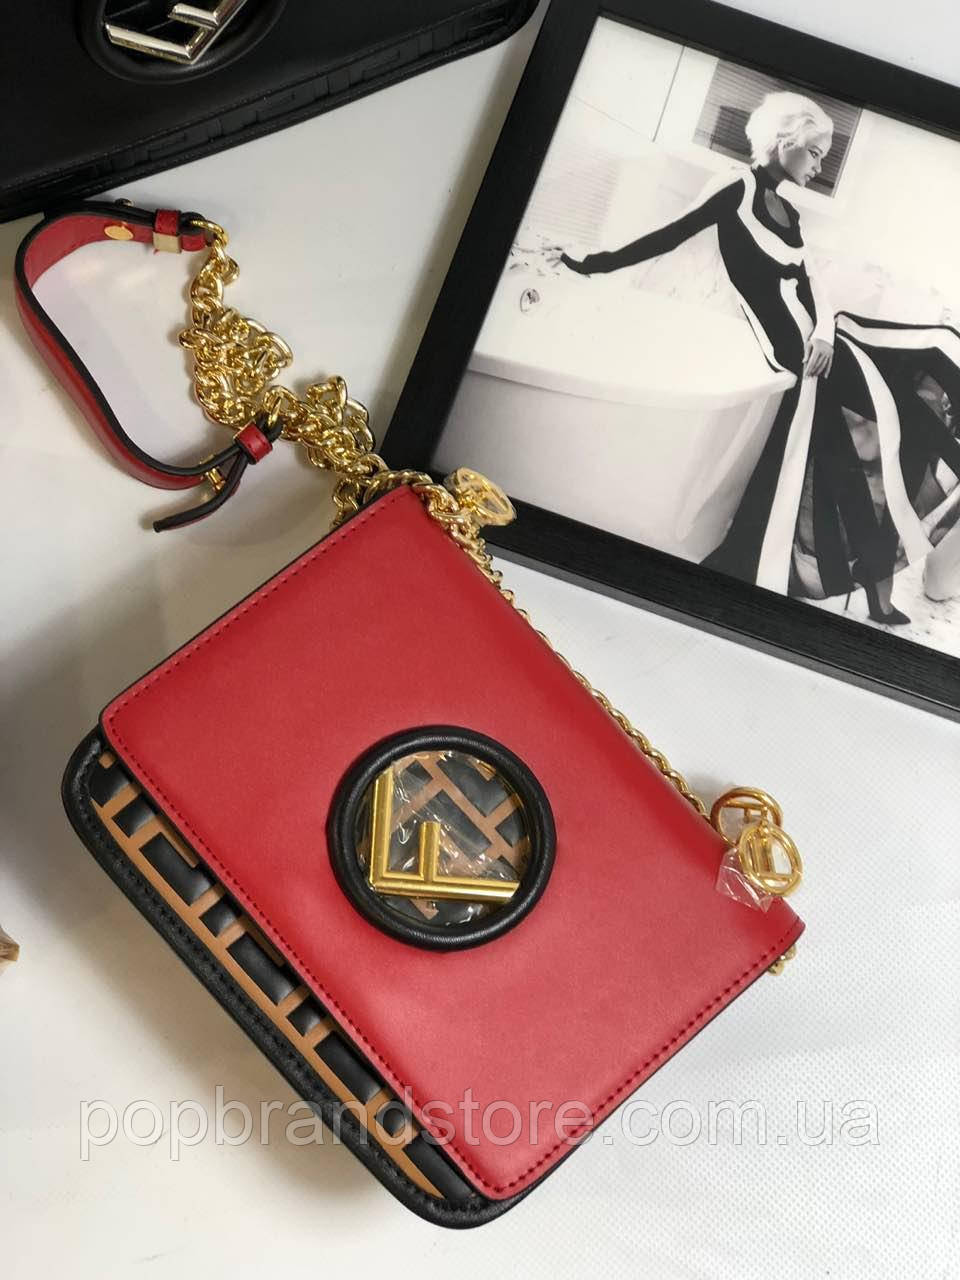 af71e99f733c Модная сумочка FENDI Kan I красная (реплика) - Pop Brand Store | брендовые  сумки